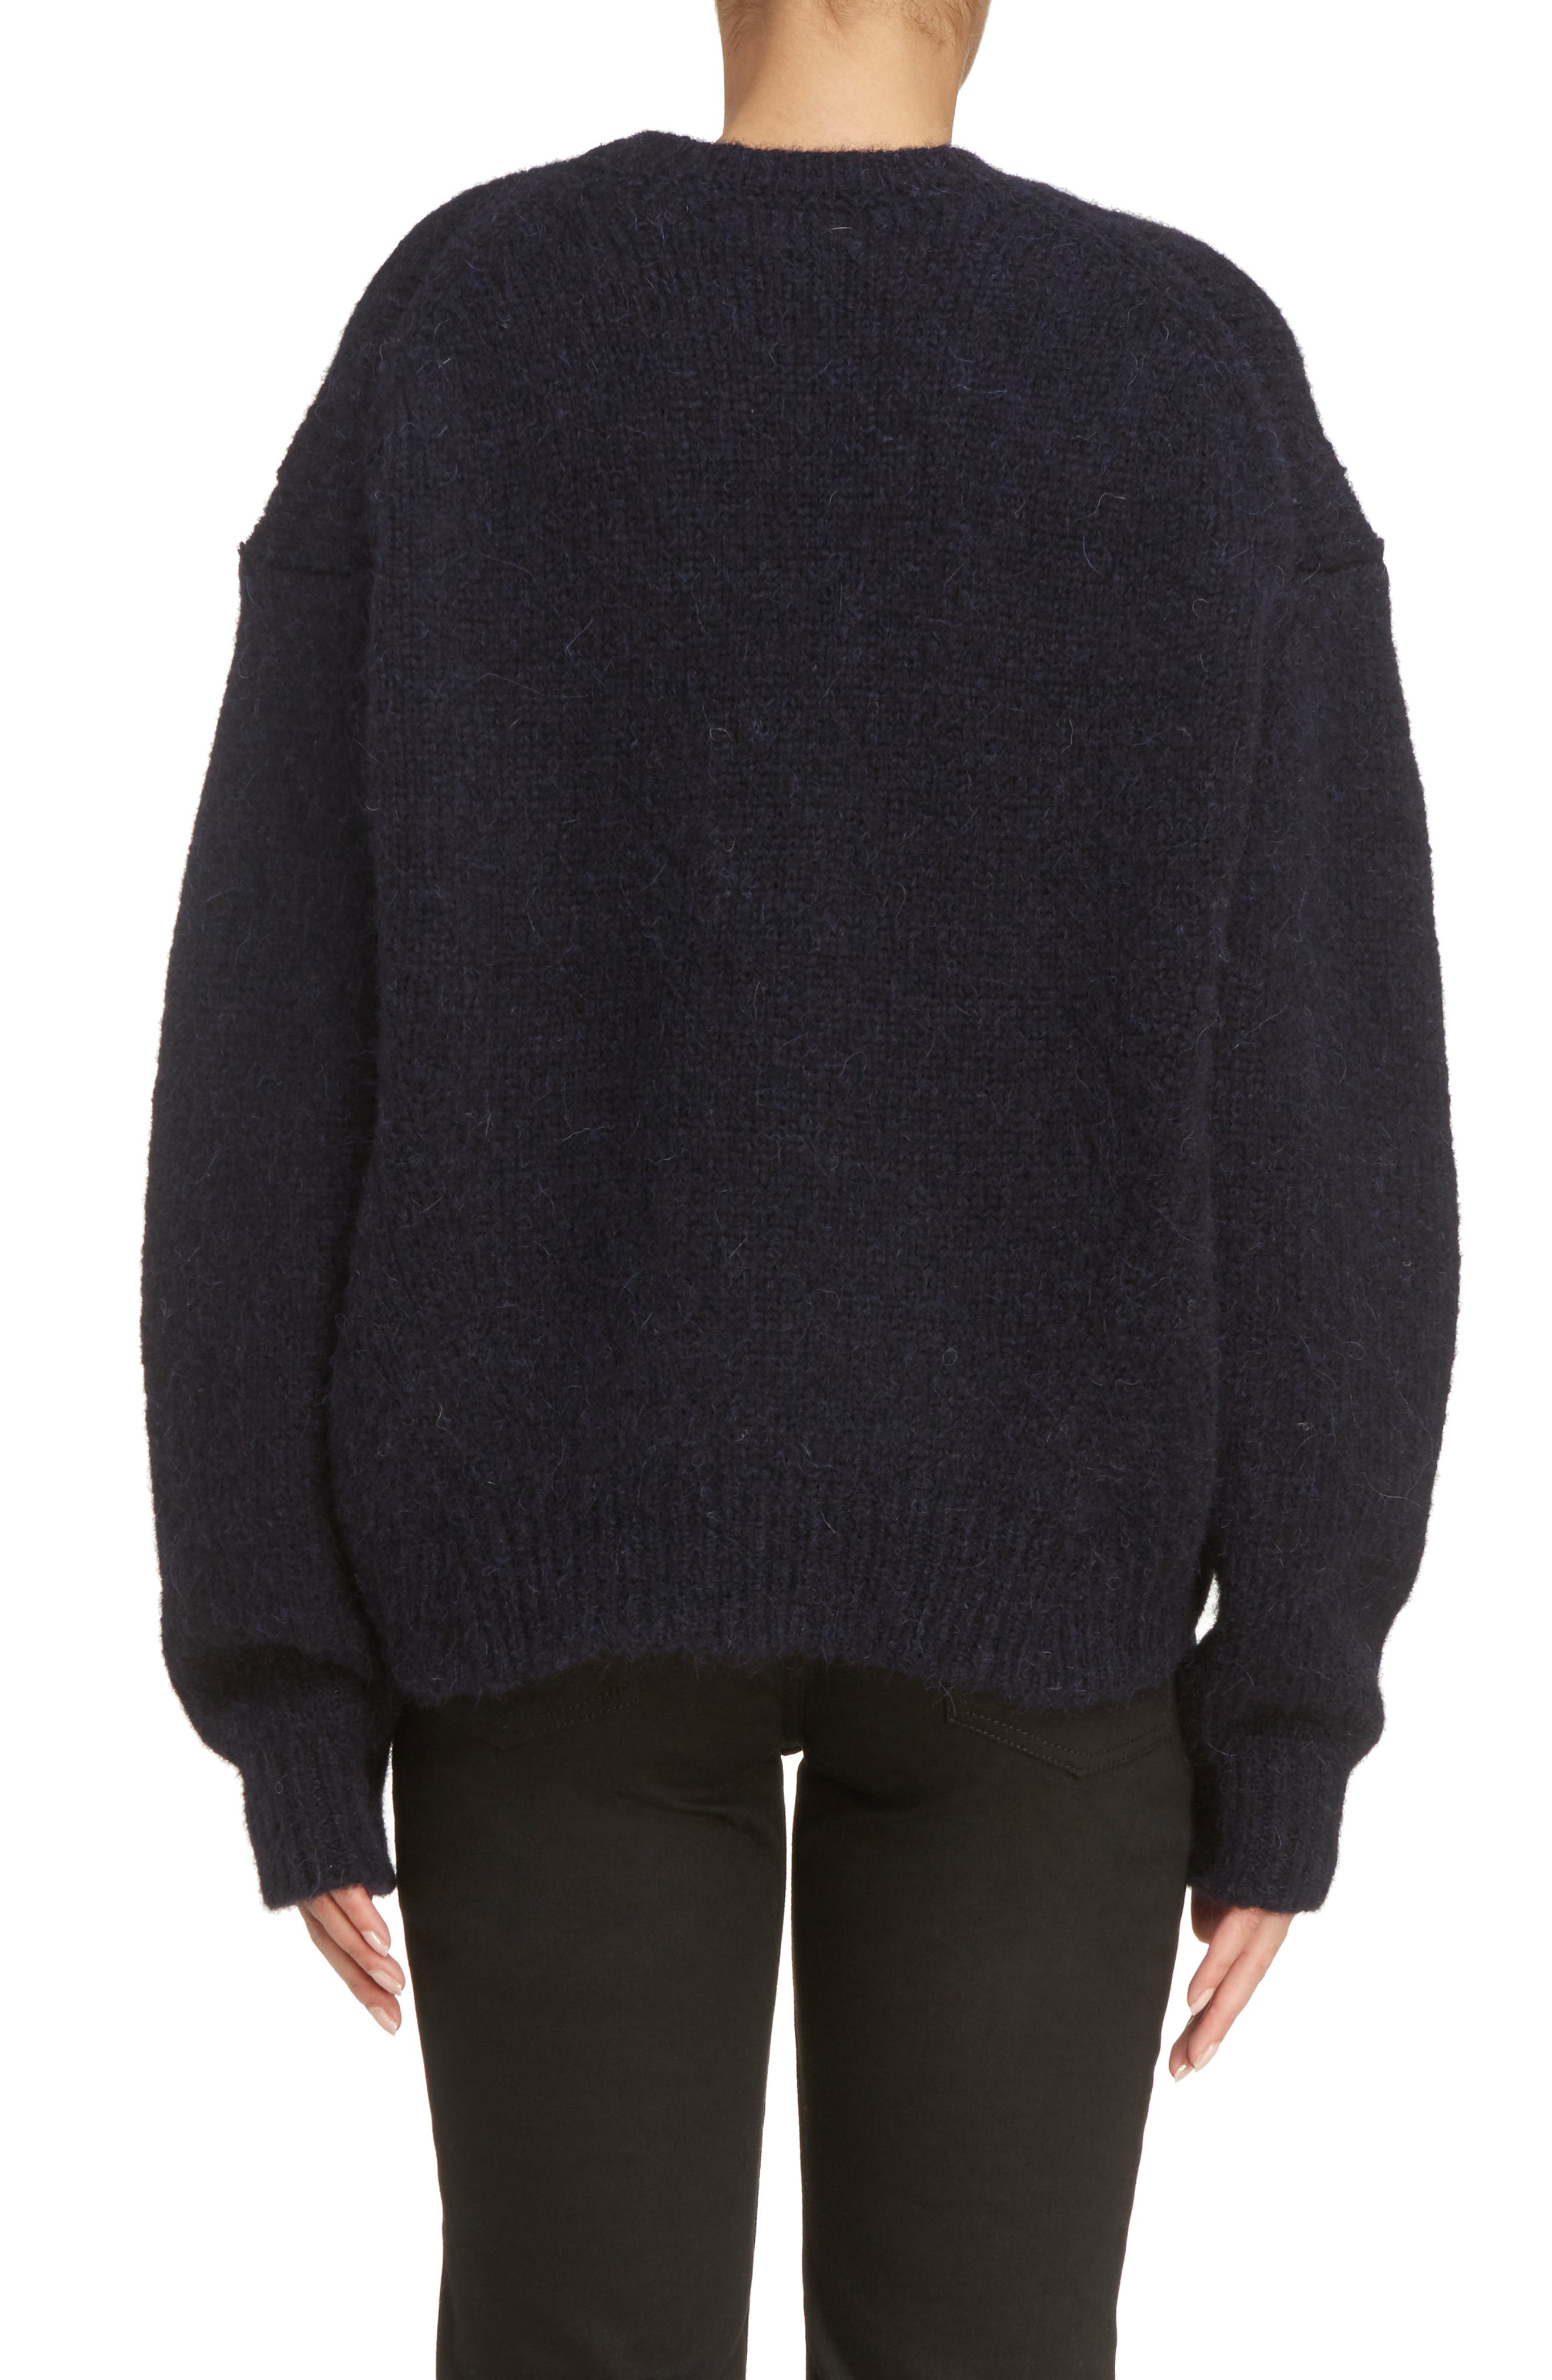 Karel Oversize Merino Sweater,                             Alternate thumbnail 2, color,                             Black